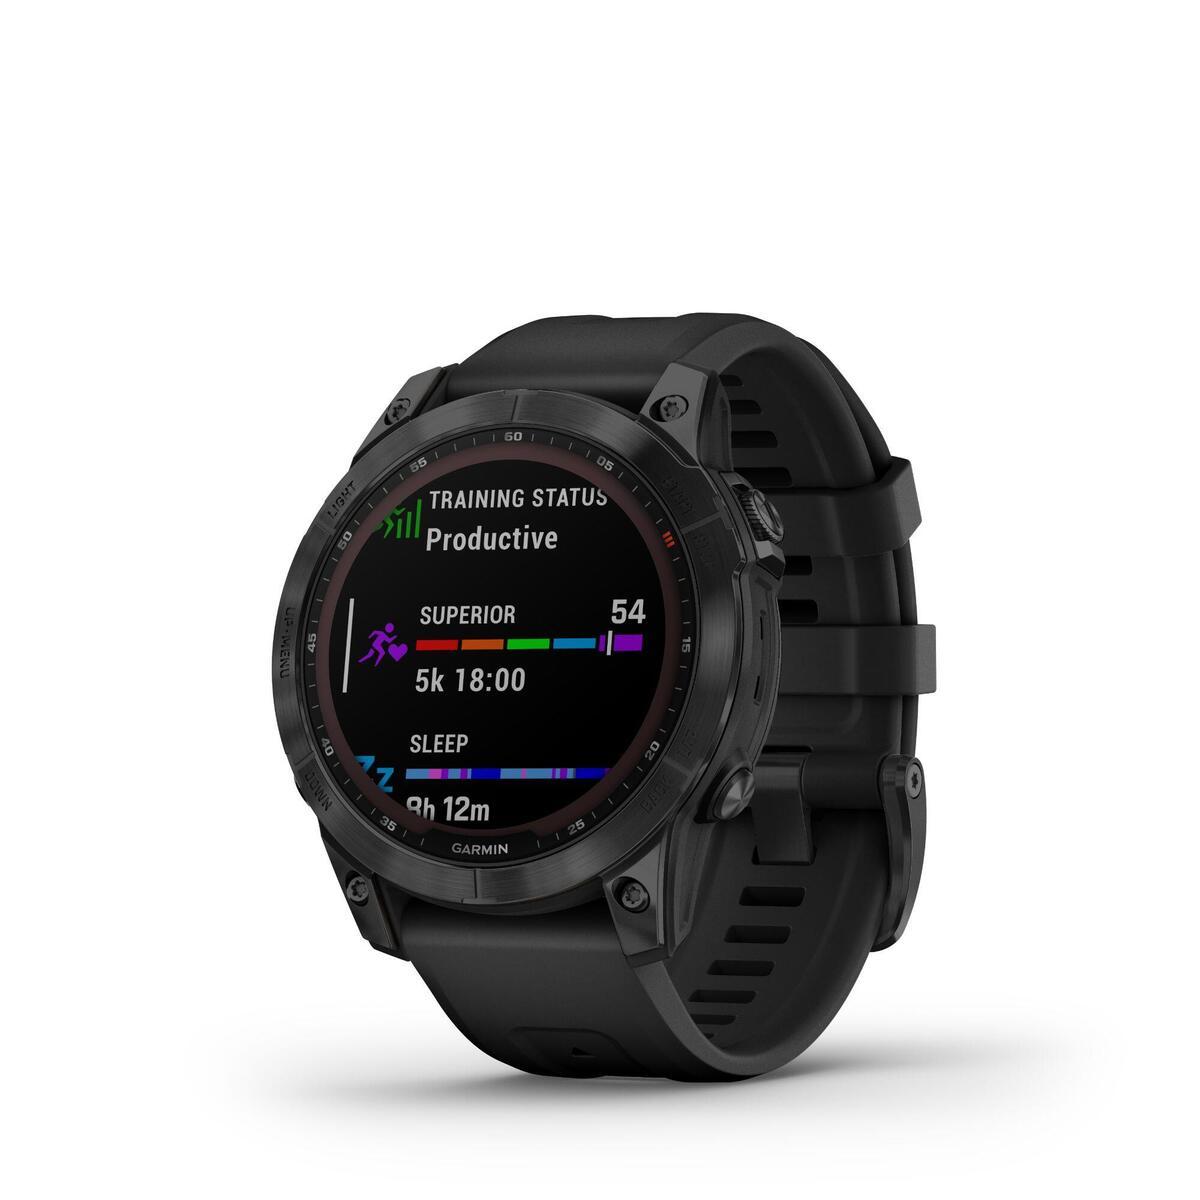 Rachetă Tenis TR960 Precision